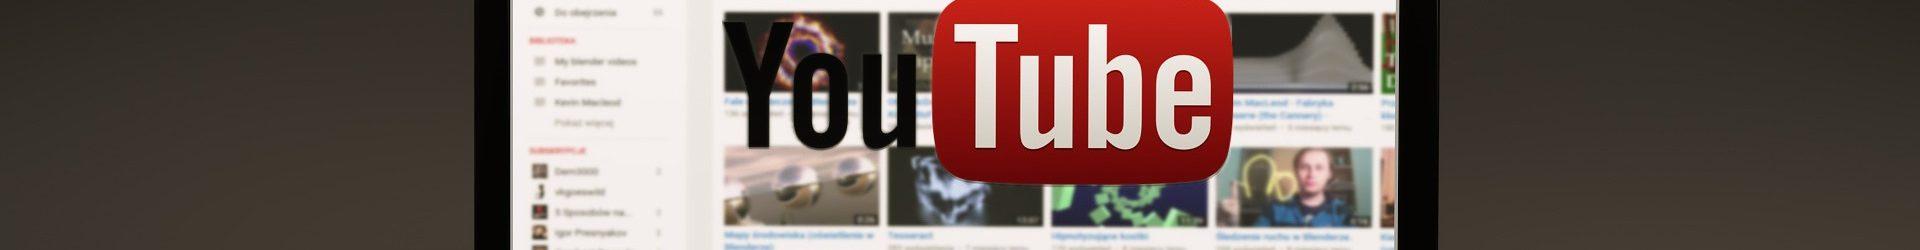 der eigene Youtube-Kanal